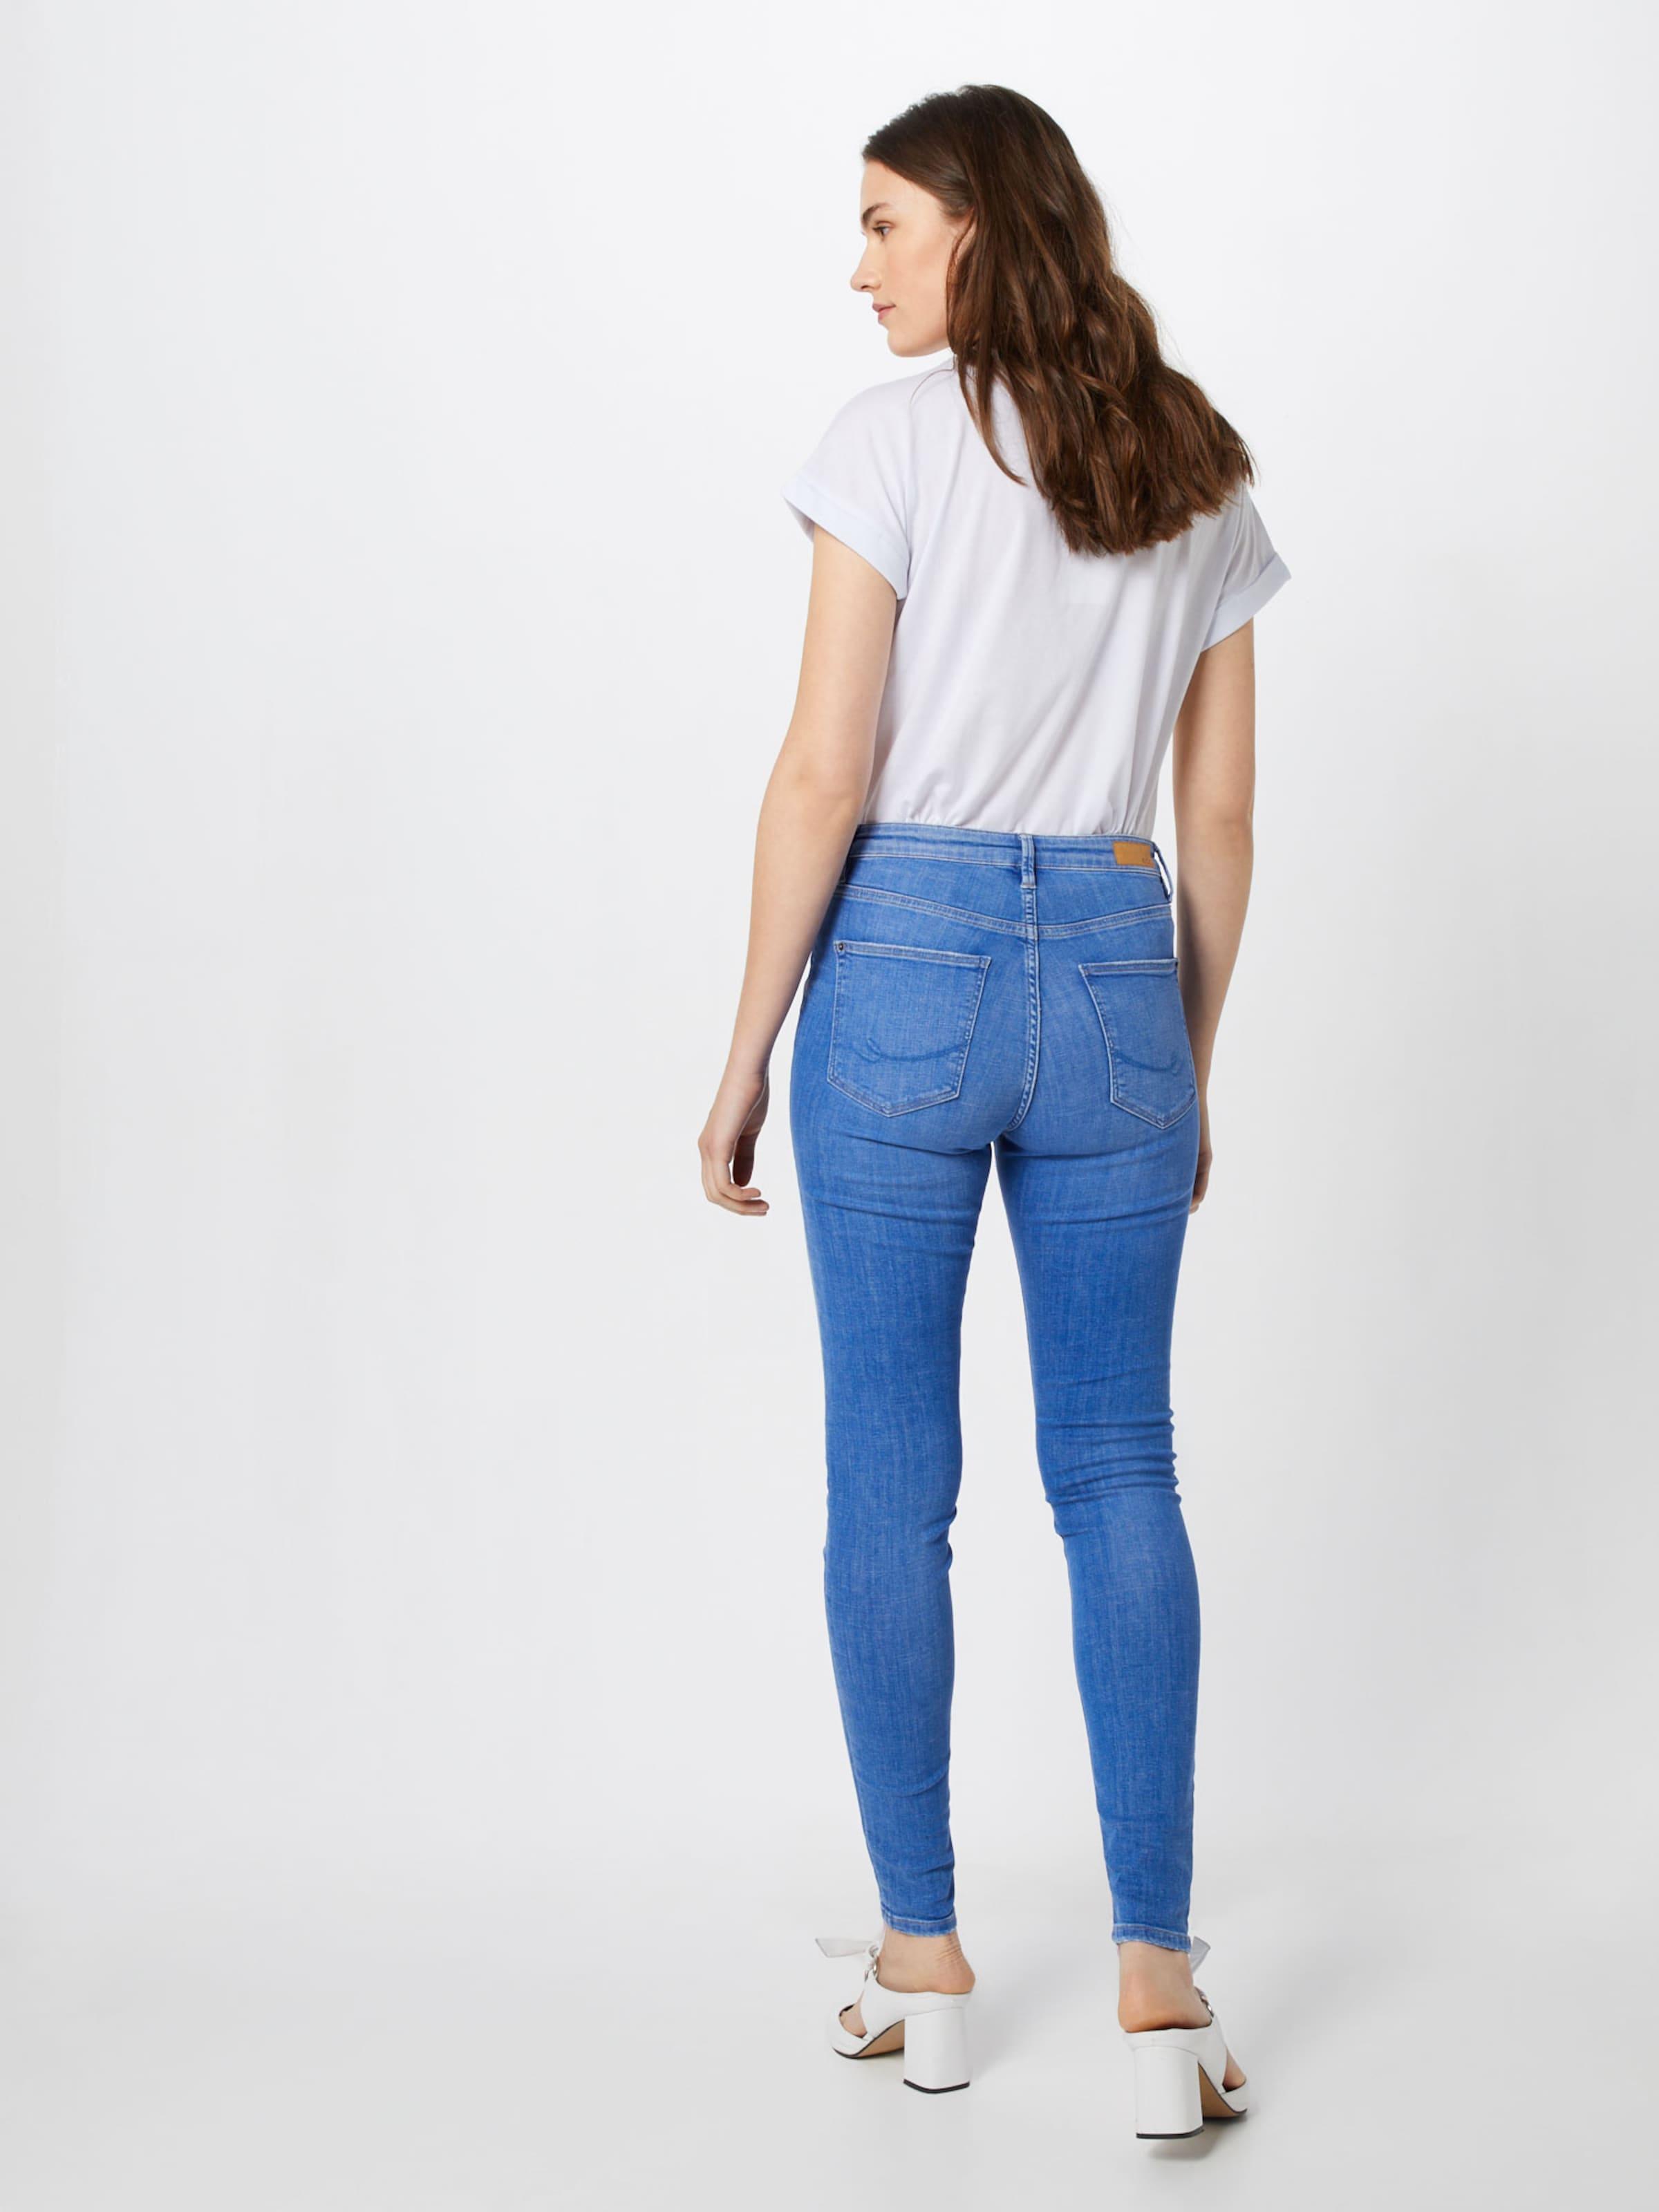 Esprit Skin Bleu Hr Ocs Edc Jean Denim Pants En Denim' By 'osn QErdWCBxoe